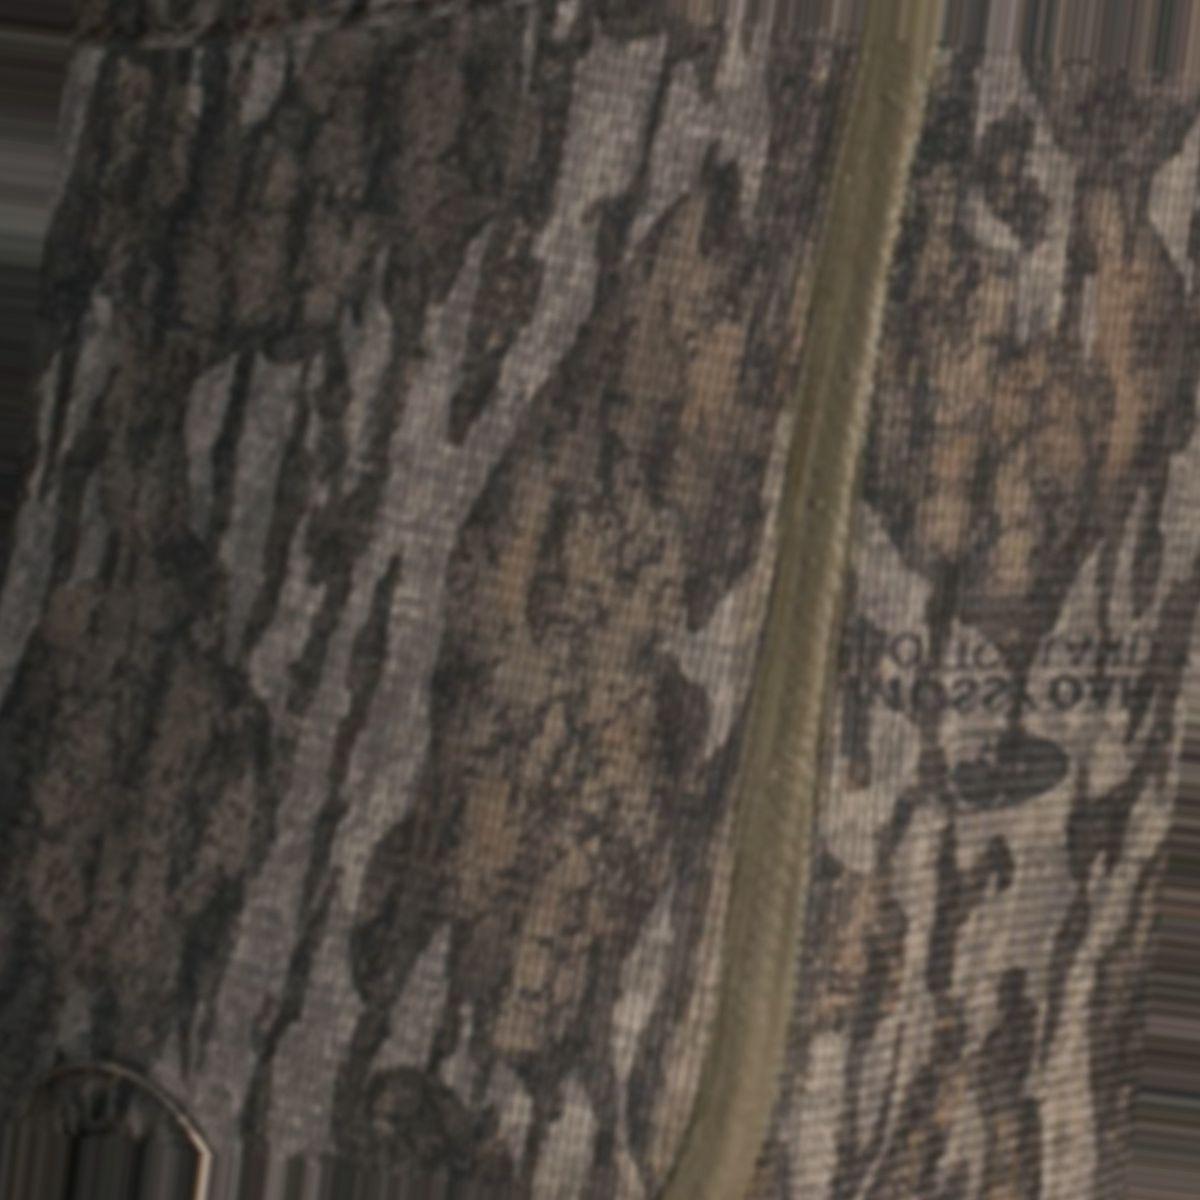 Drake Waterfowl Men's LST Eqwader 2.0 Hunting Waders – Regular